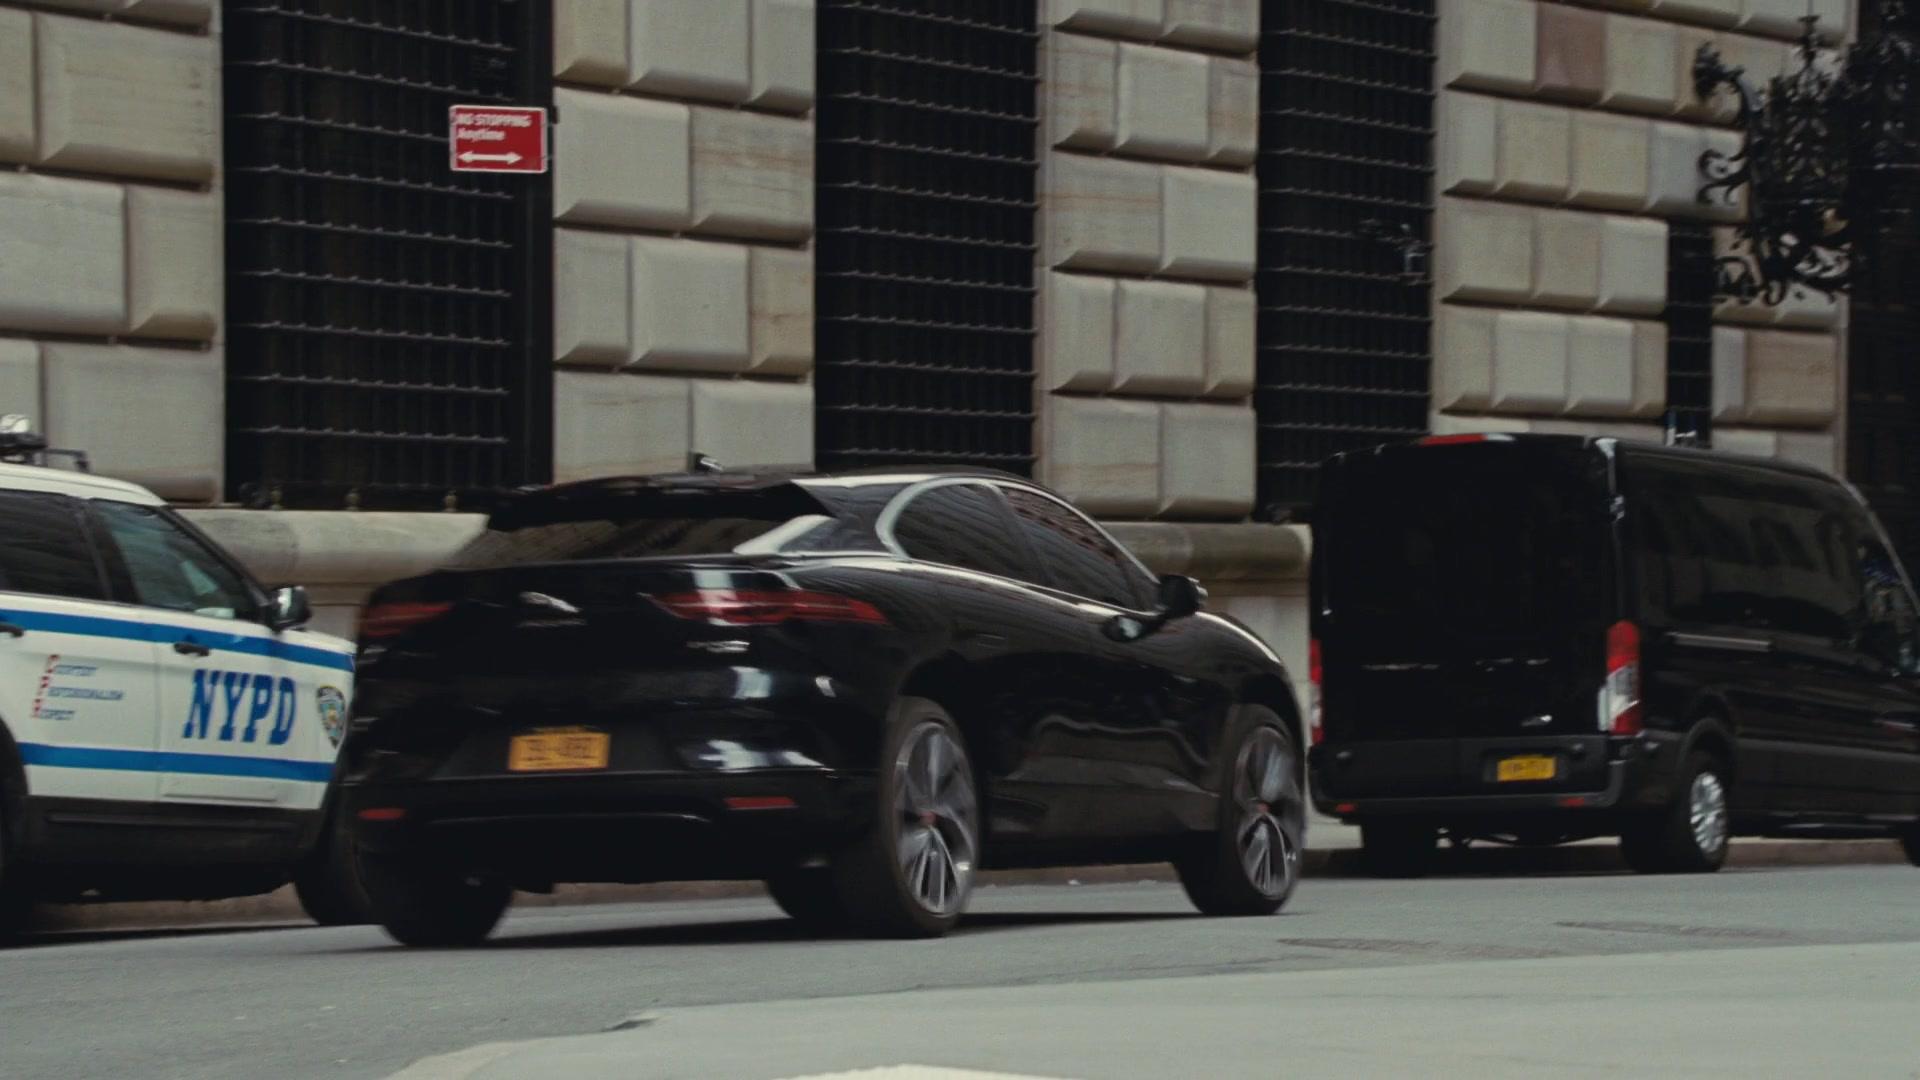 Jaguar I-PACE All-Electric Car in Succession - Season 2